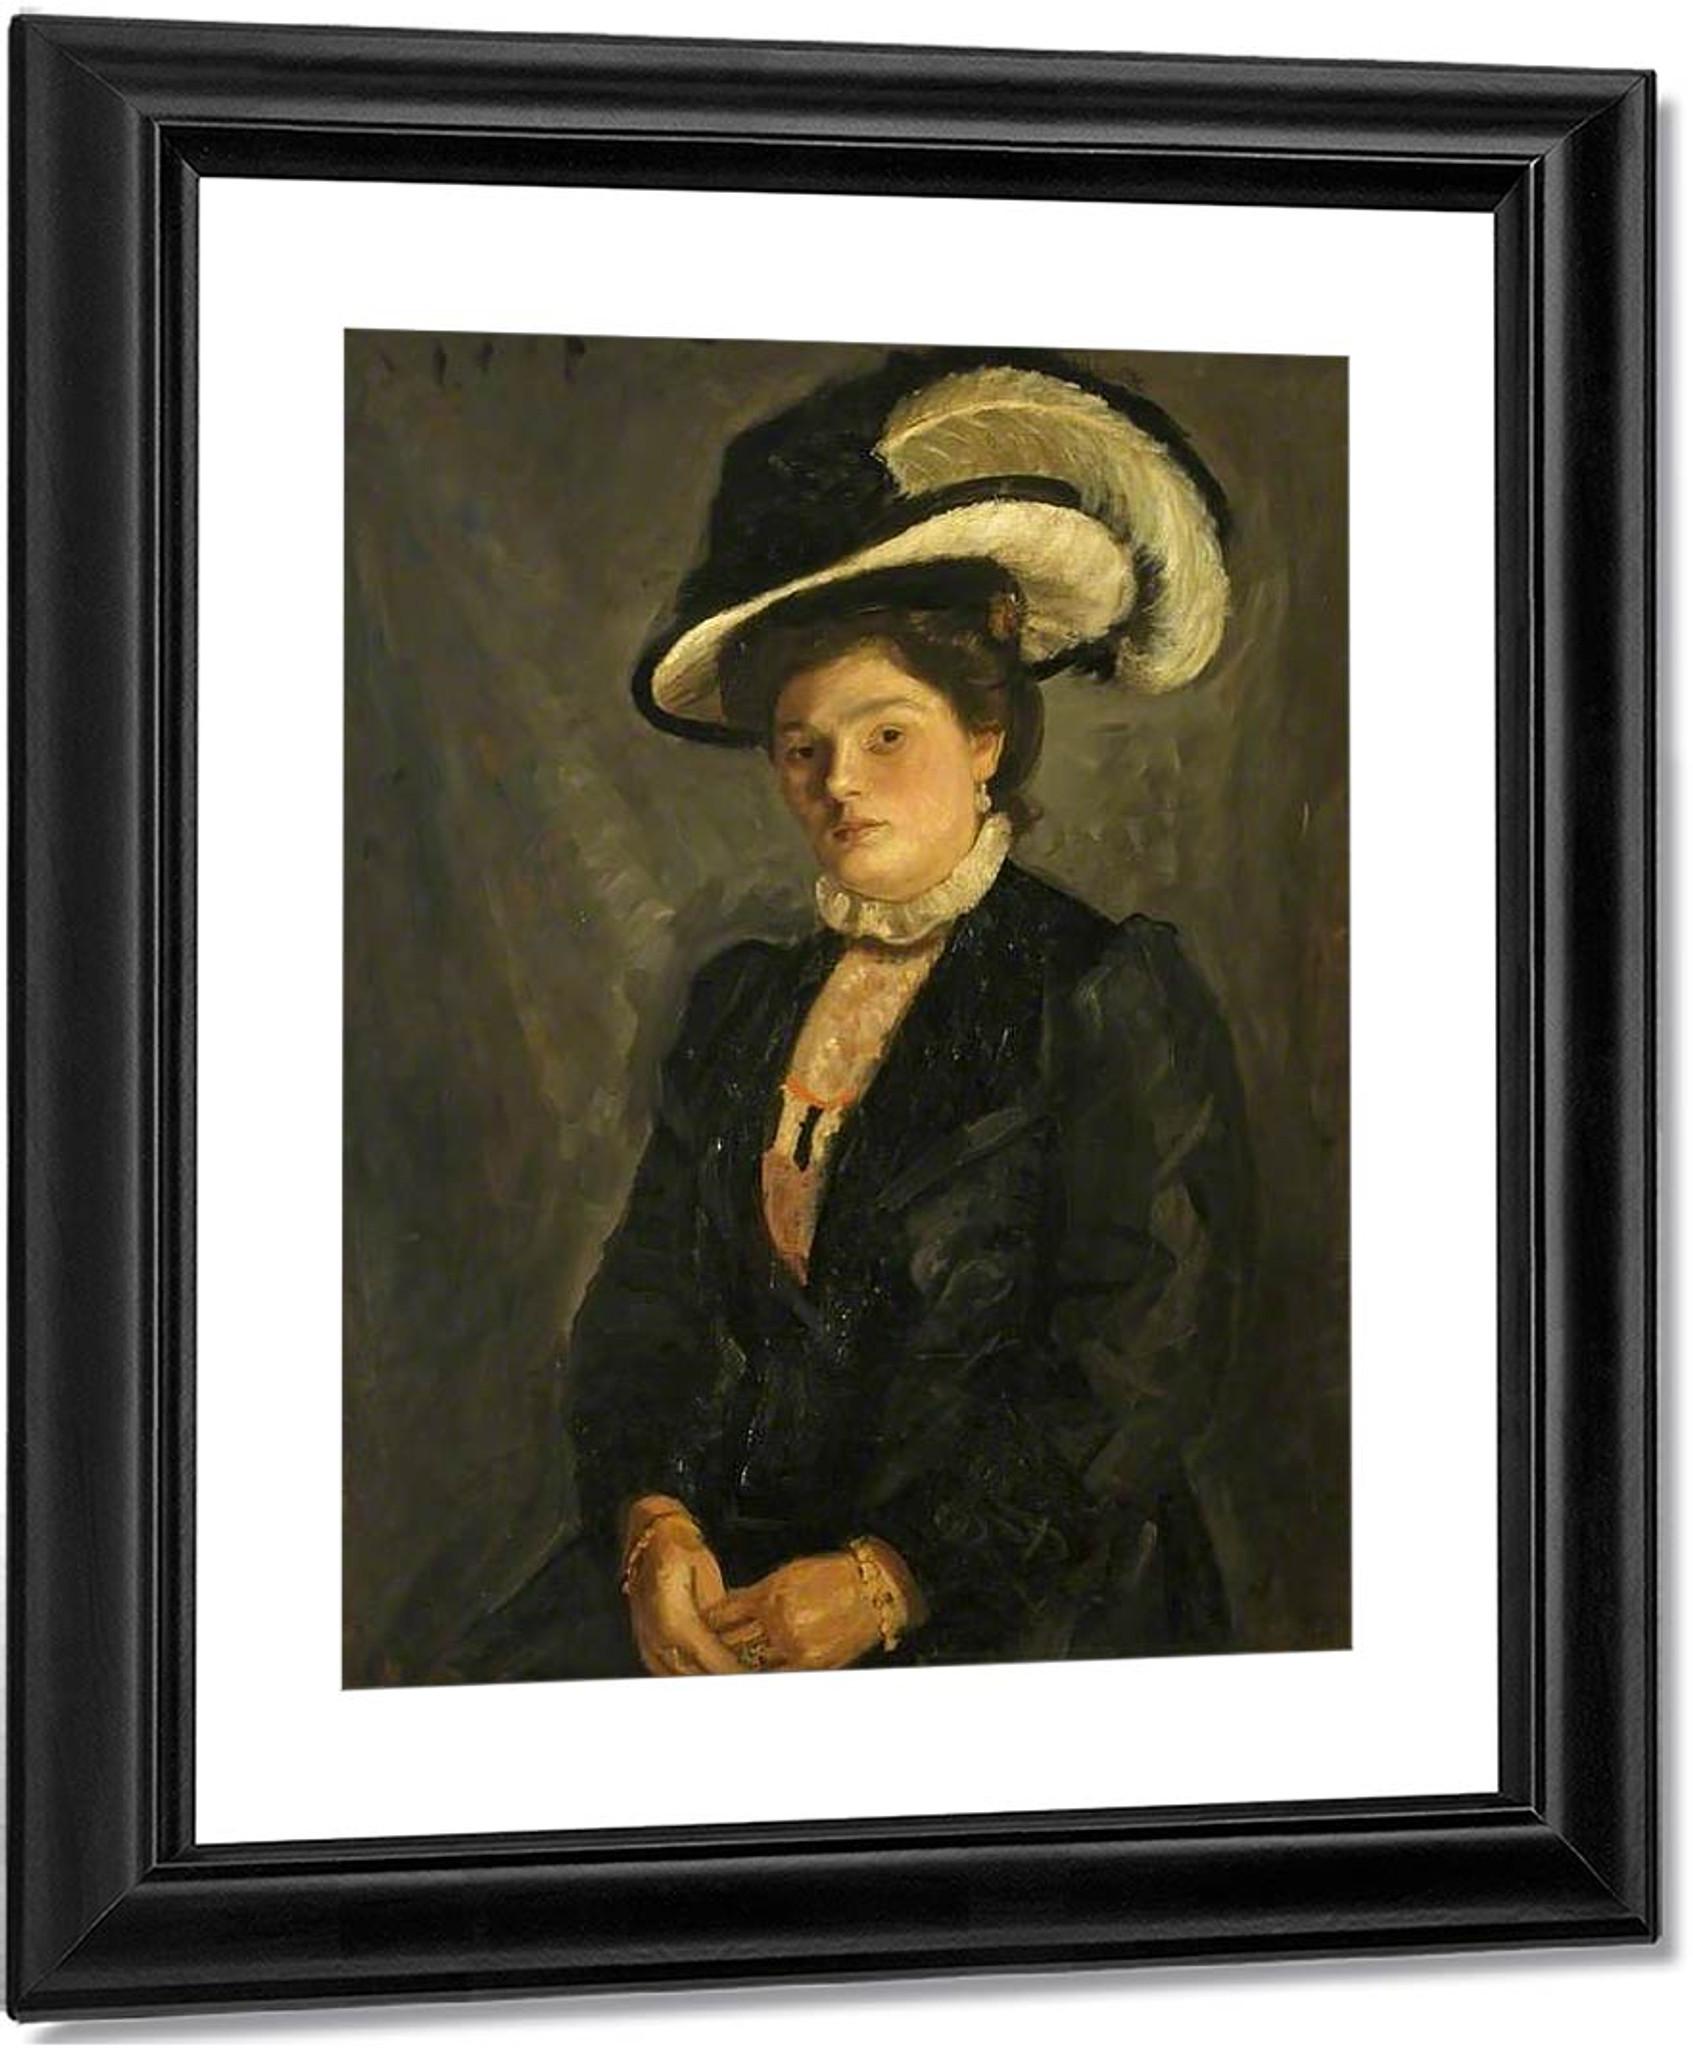 The Artist's Sister, Deborah By Mark Gertler Oil on Canvas Reproduction